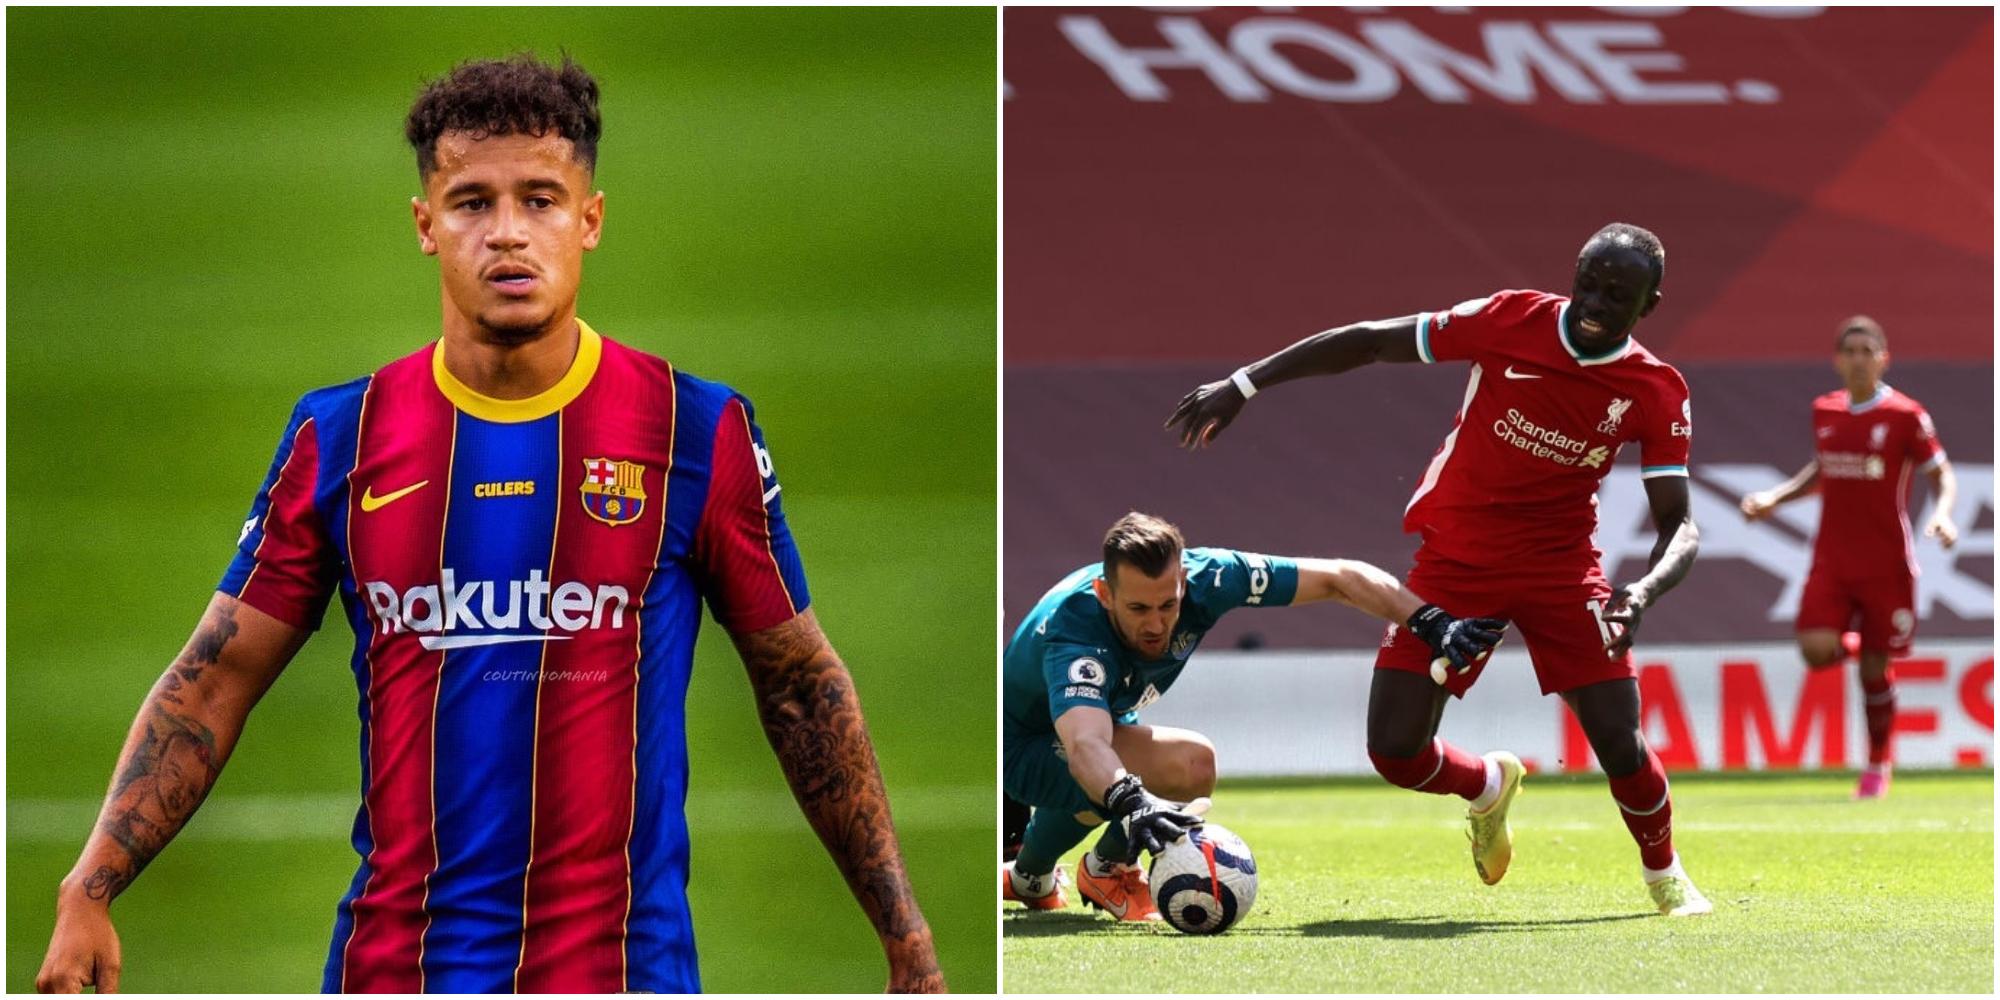 Liverpool fan makes excellent Mane point with Coutinho comparison